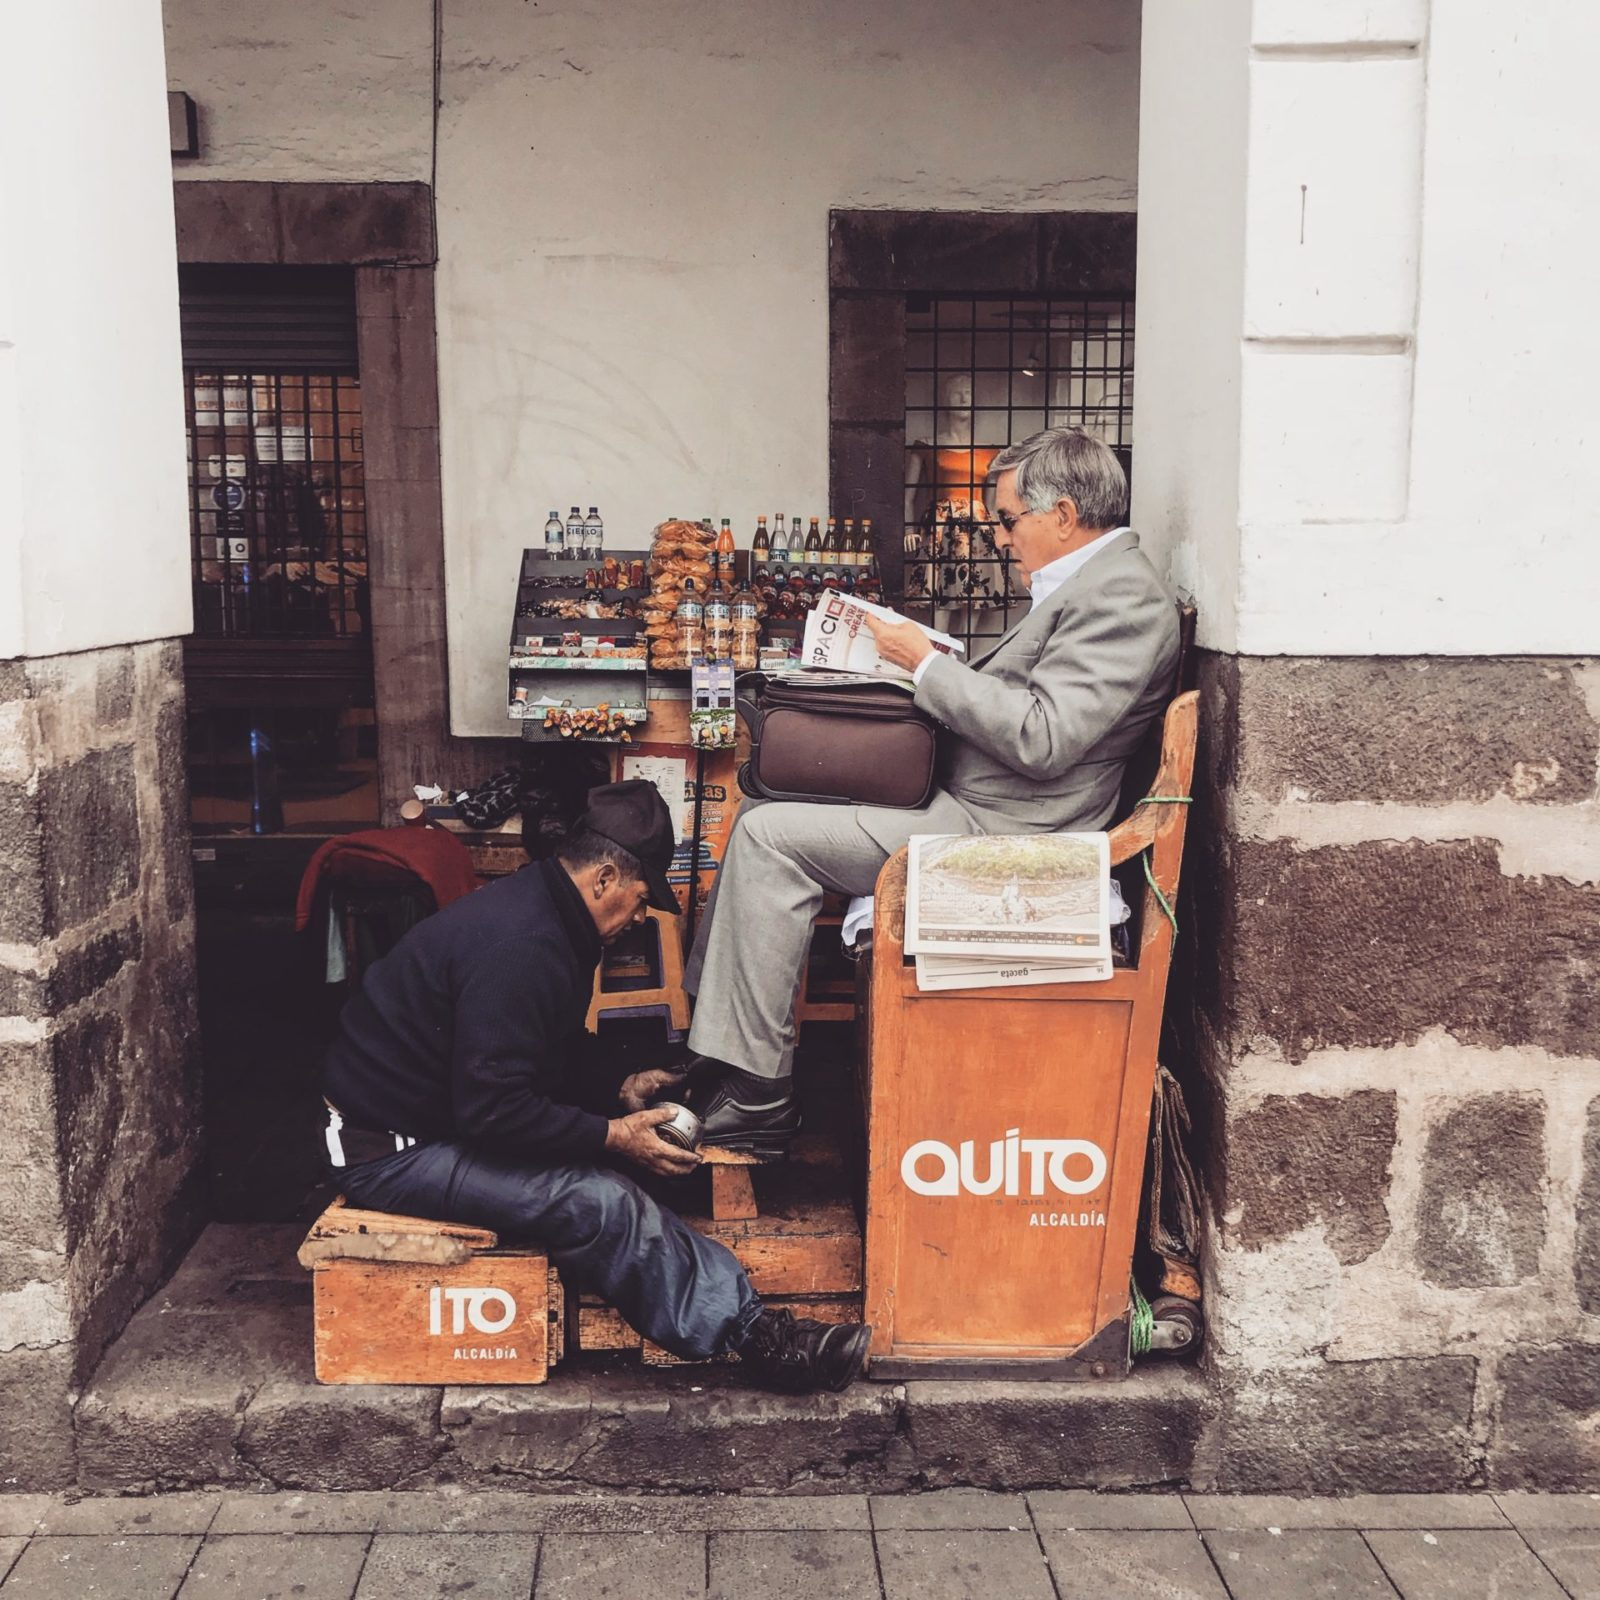 Quito codzienne życie